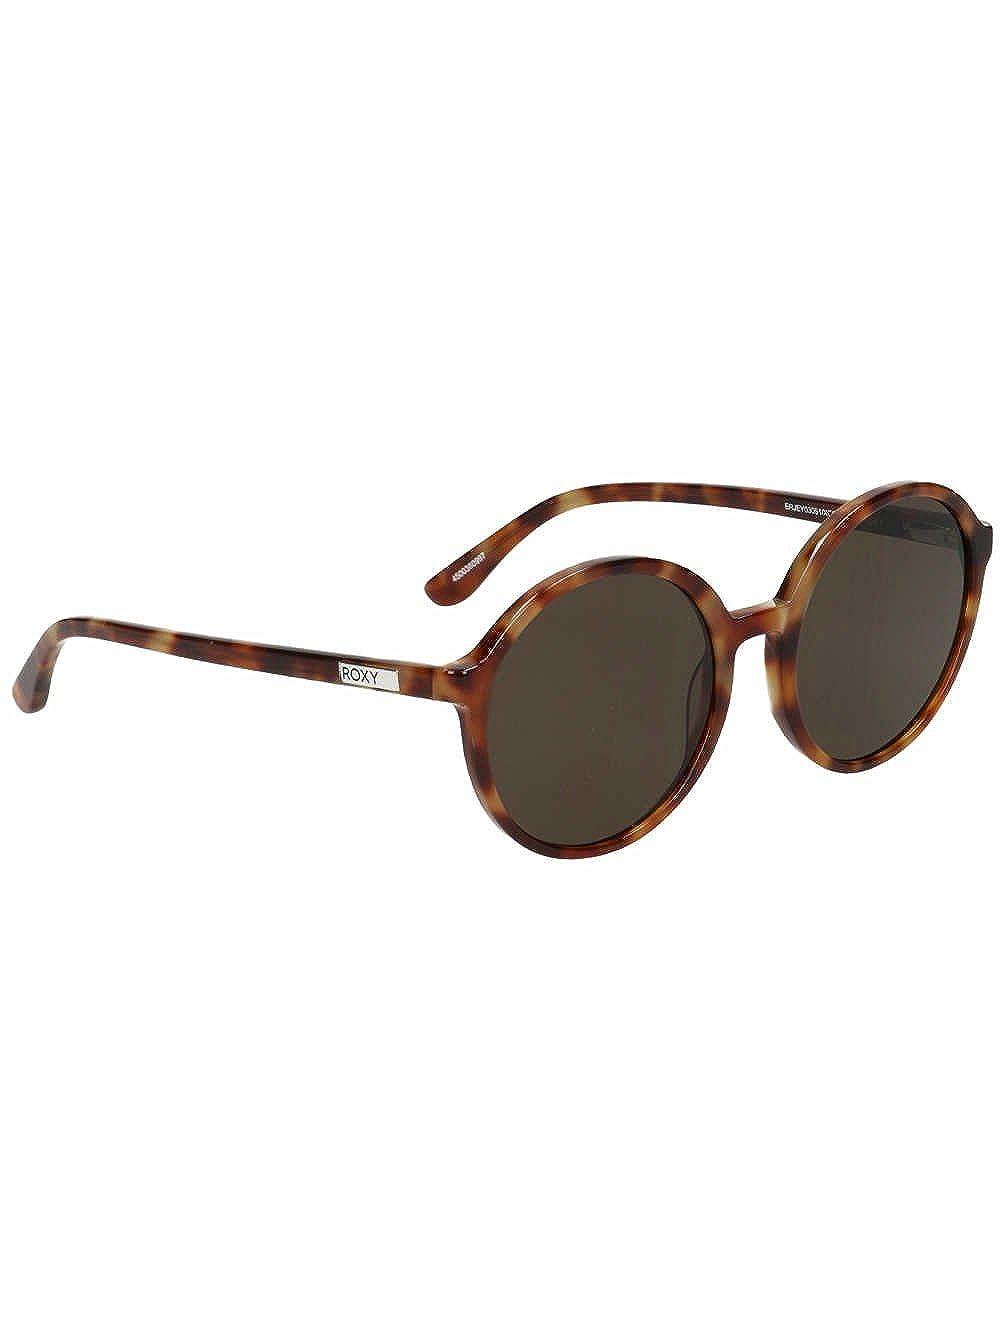 New Women Sunglasses Roxy ERJEY03051 Blossom XCCC B01MSEOGDQ Tortoise, 品質検査済 4dc5f76c